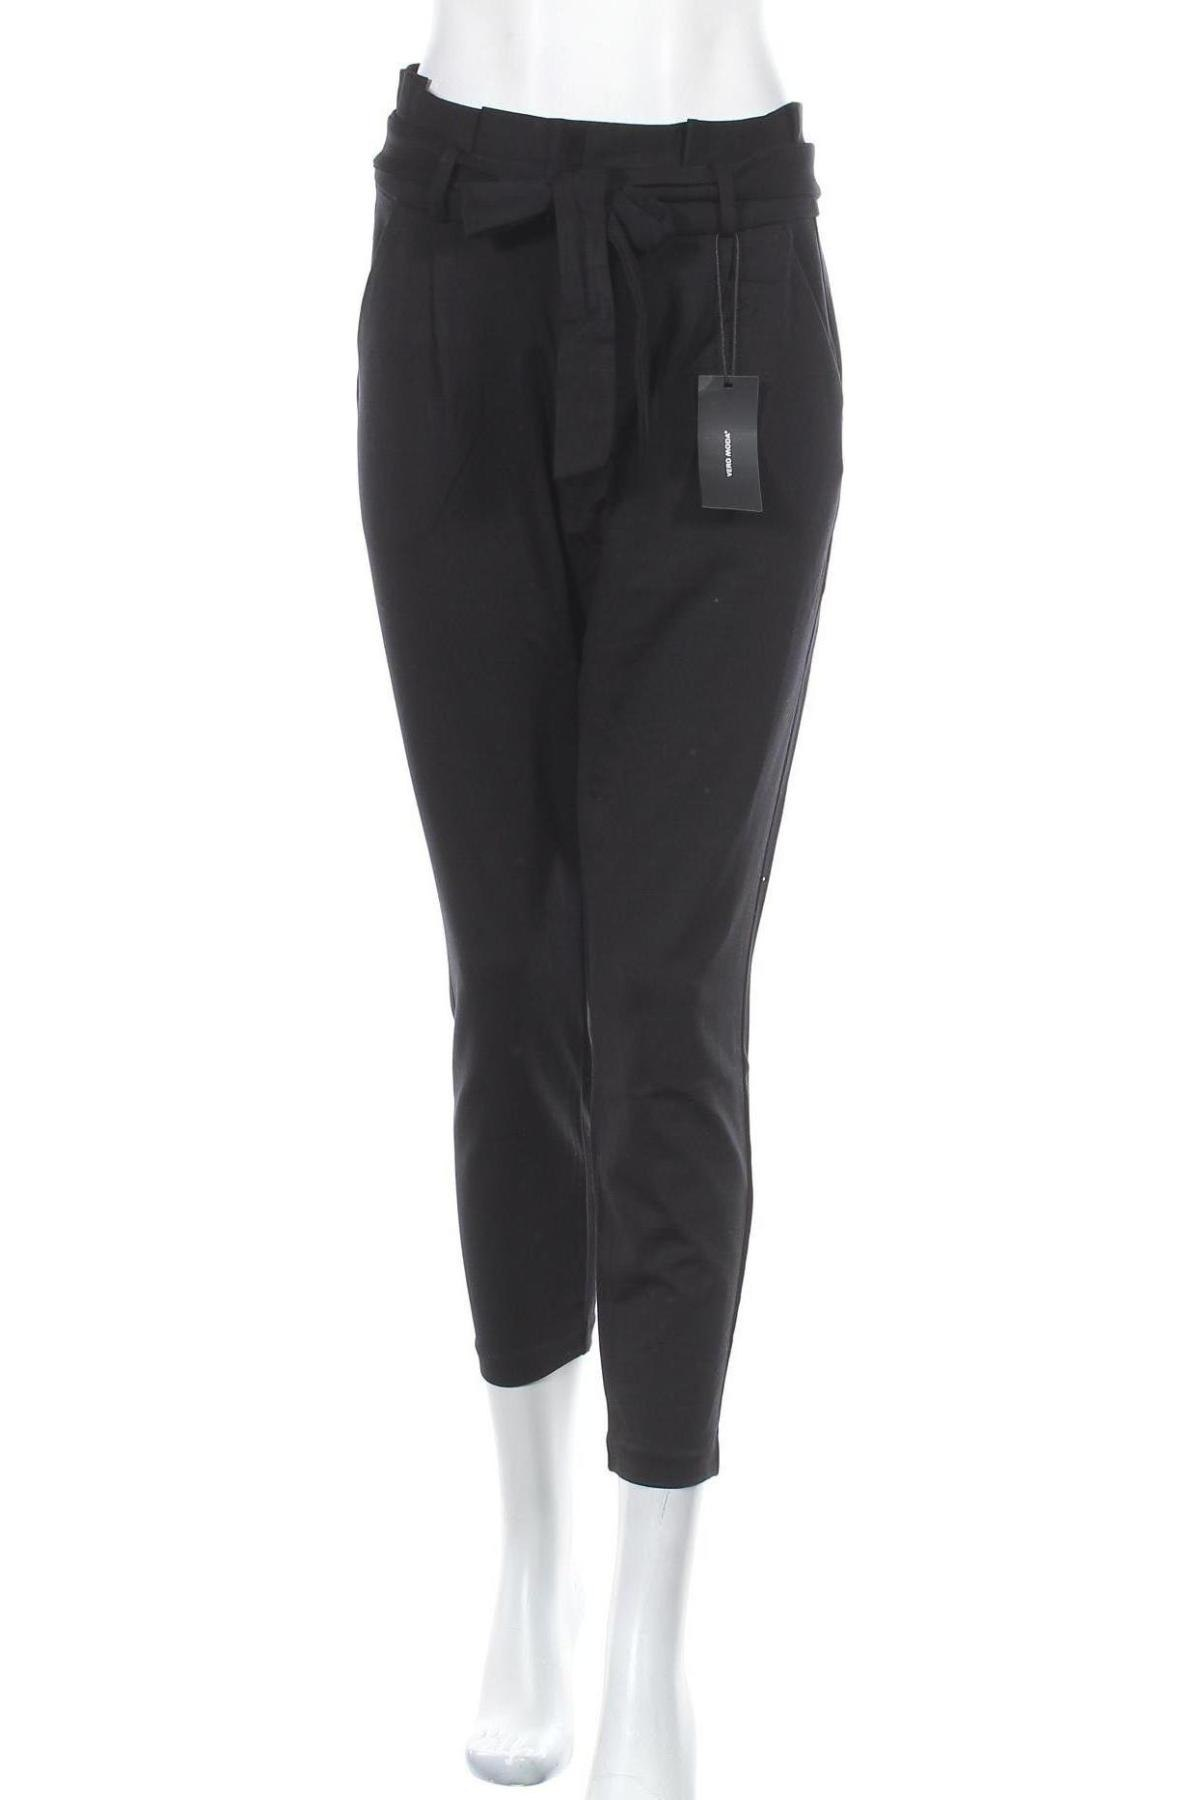 Дамски панталон Vero Moda, Размер L, Цвят Черен, 65% вискоза, 30% полиамид, 5% еластан, Цена 16,58лв.